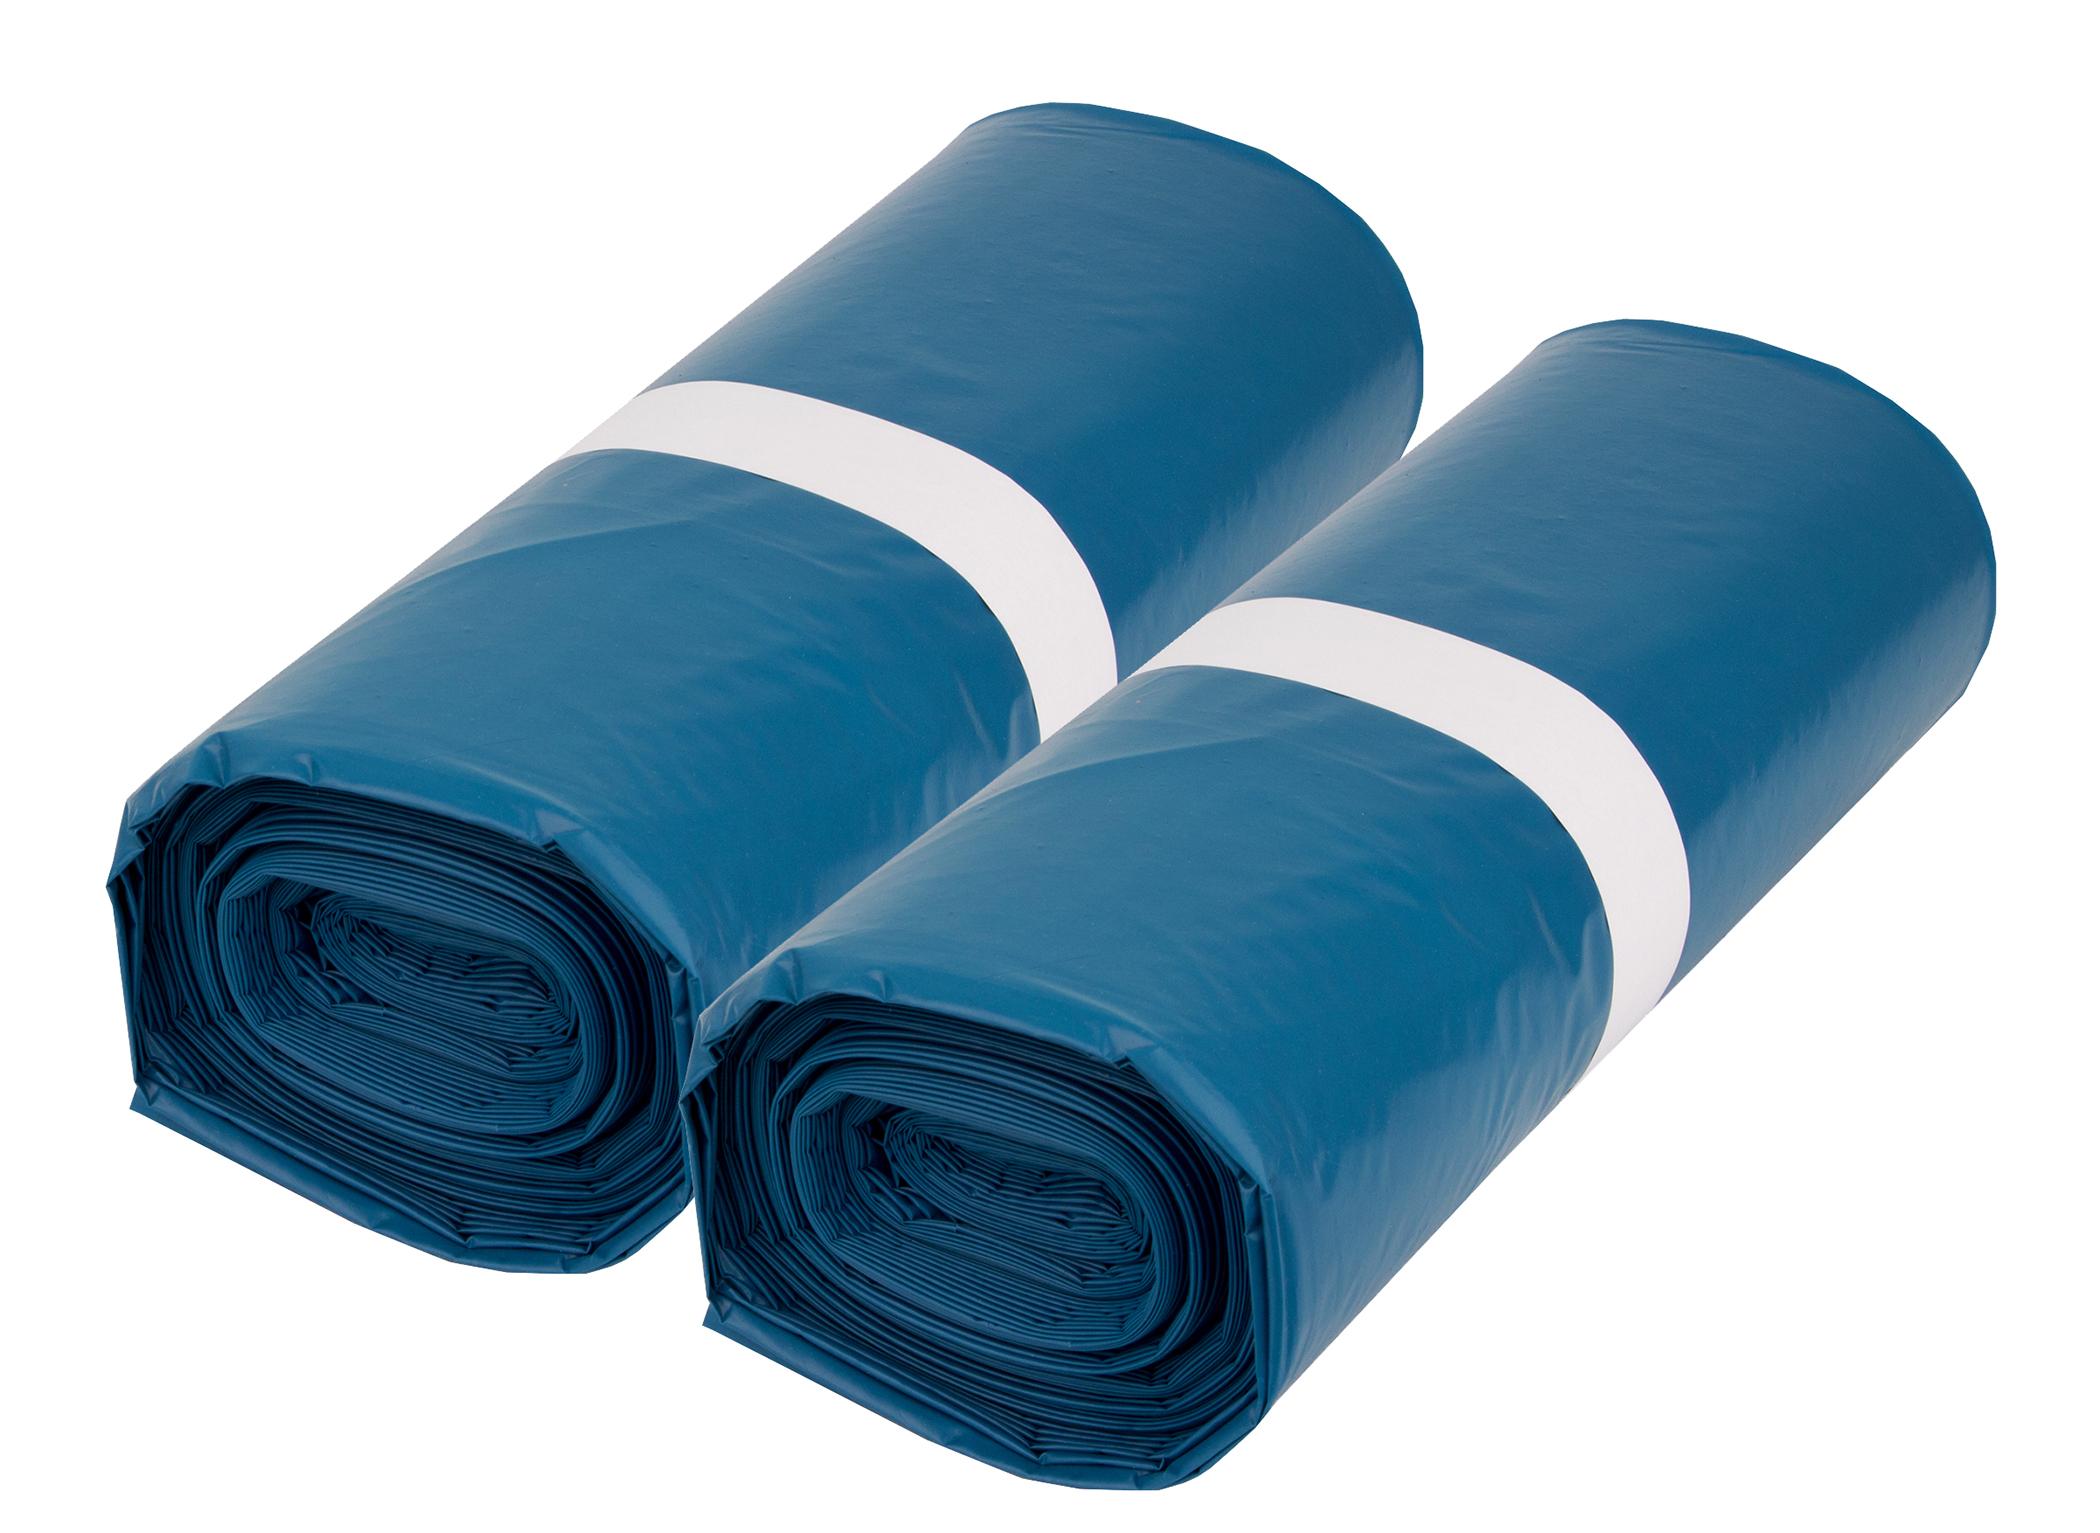 Müllsäcke Blau Abfallbeutel Mülltüten Müllbeutel 240 Liter 25 Stück